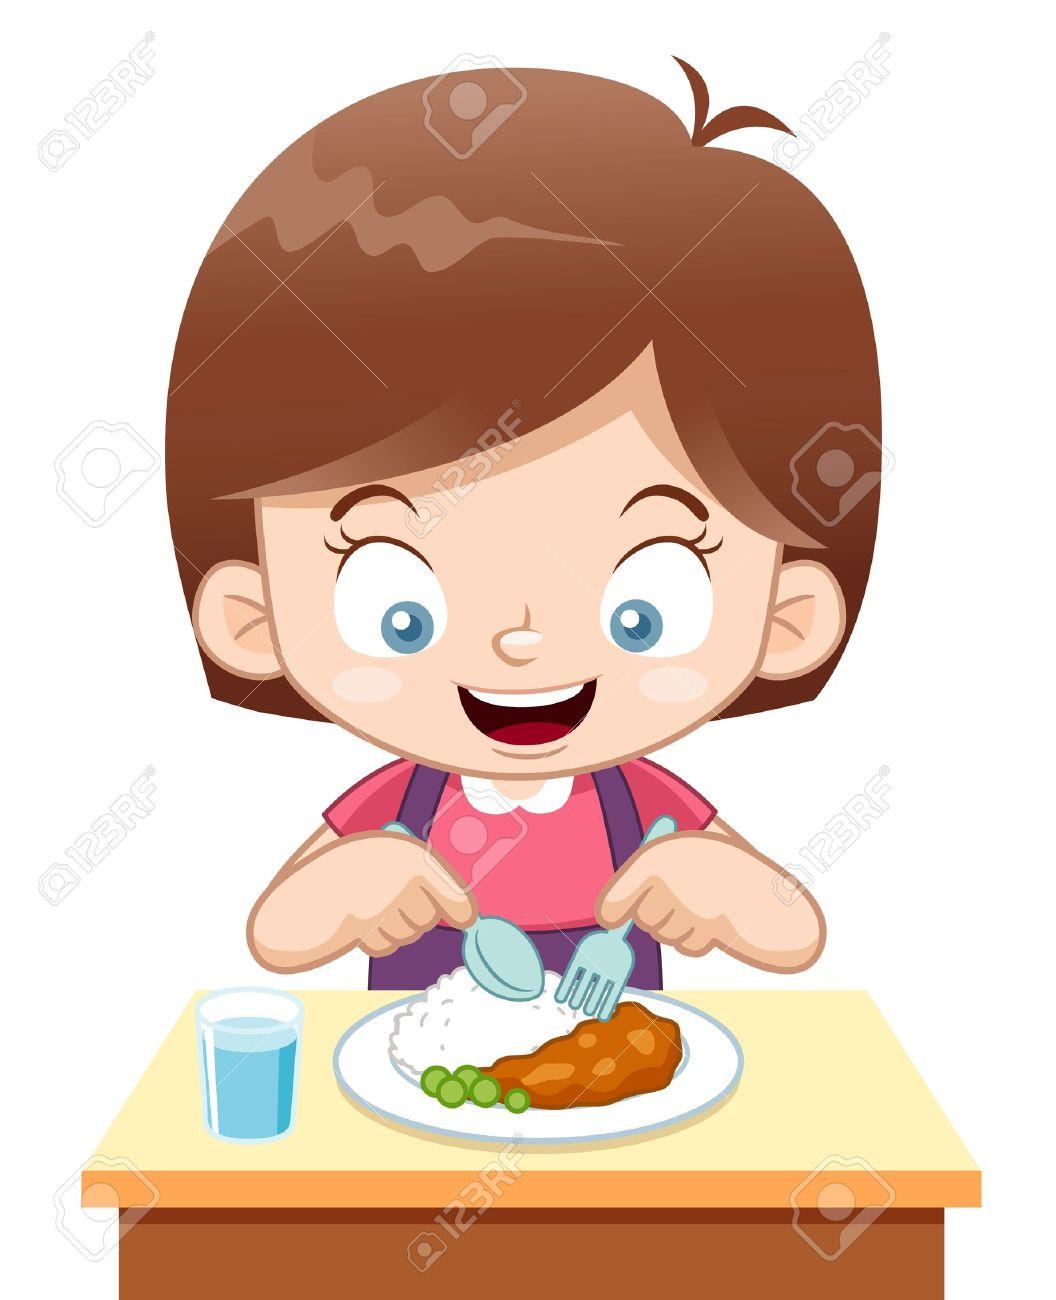 rice cartoon illustration of cartoon girl eating illustration - Cartoon Picture Of Child